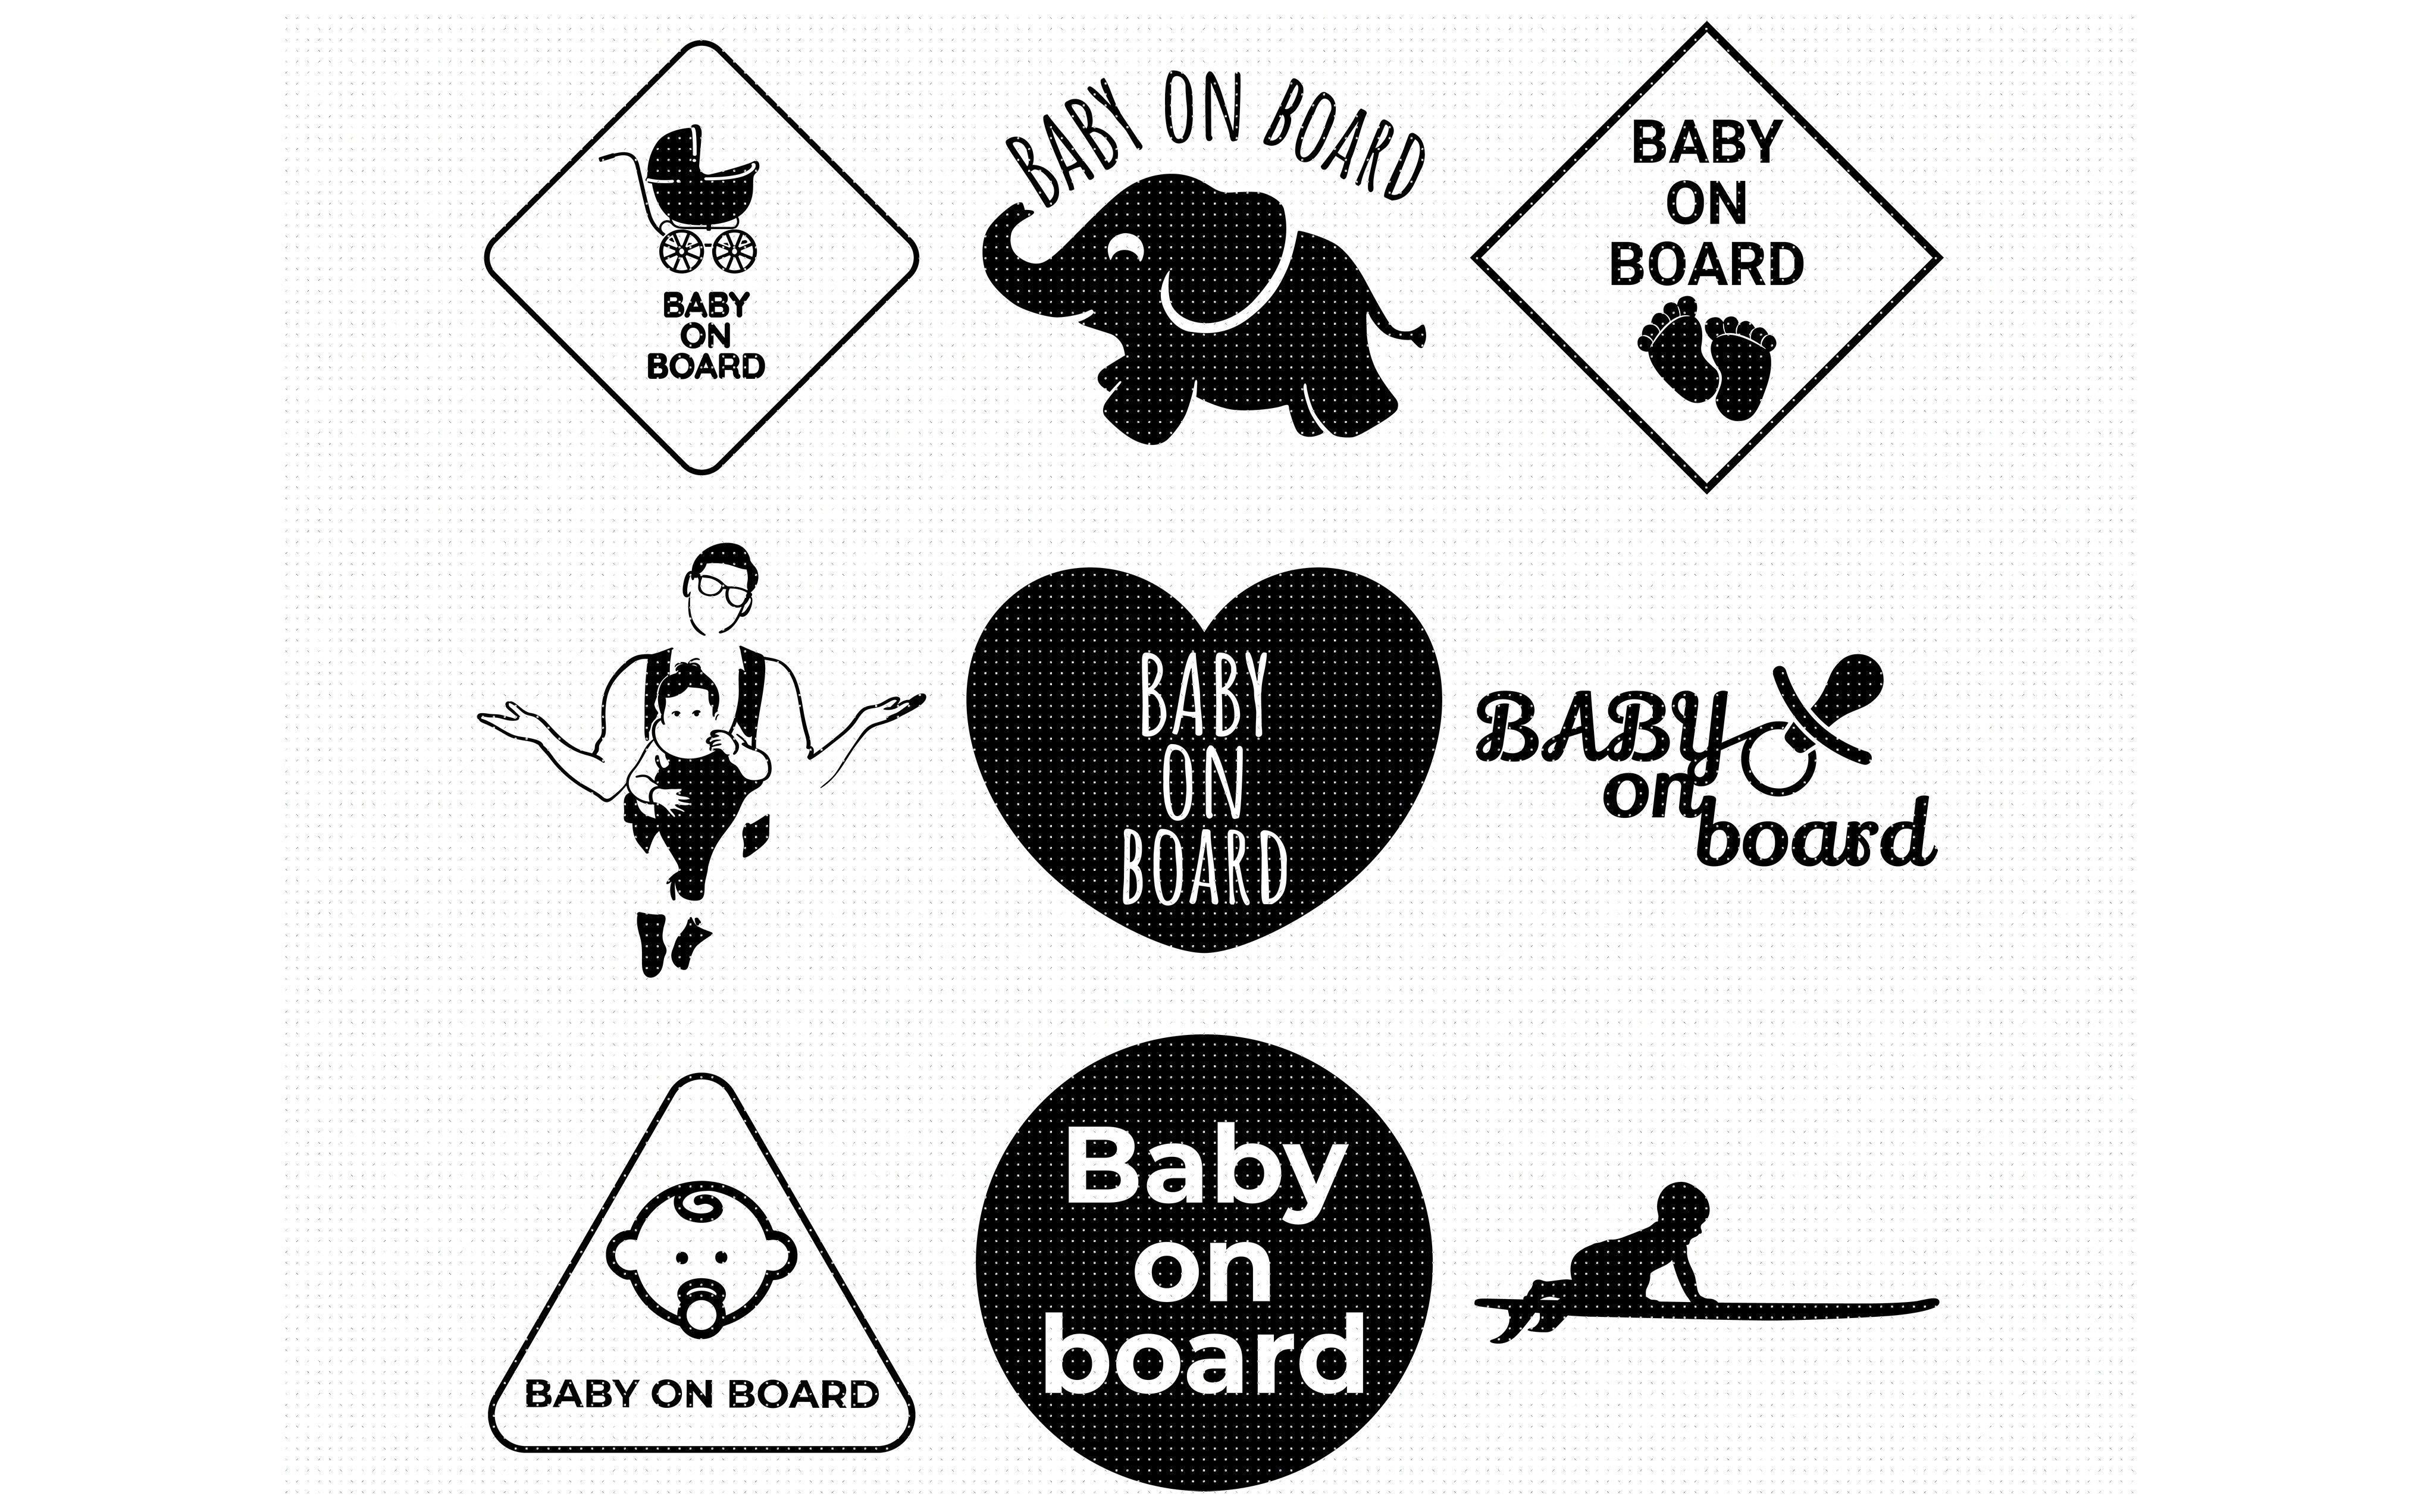 ai svg dxf png,pdf LEOPARD Clipart-Vector Clip Art Graphics-Digital Download Image-Cut Ready Files-CNC-Logo-Mascot-Vinyl Sign Design-eps